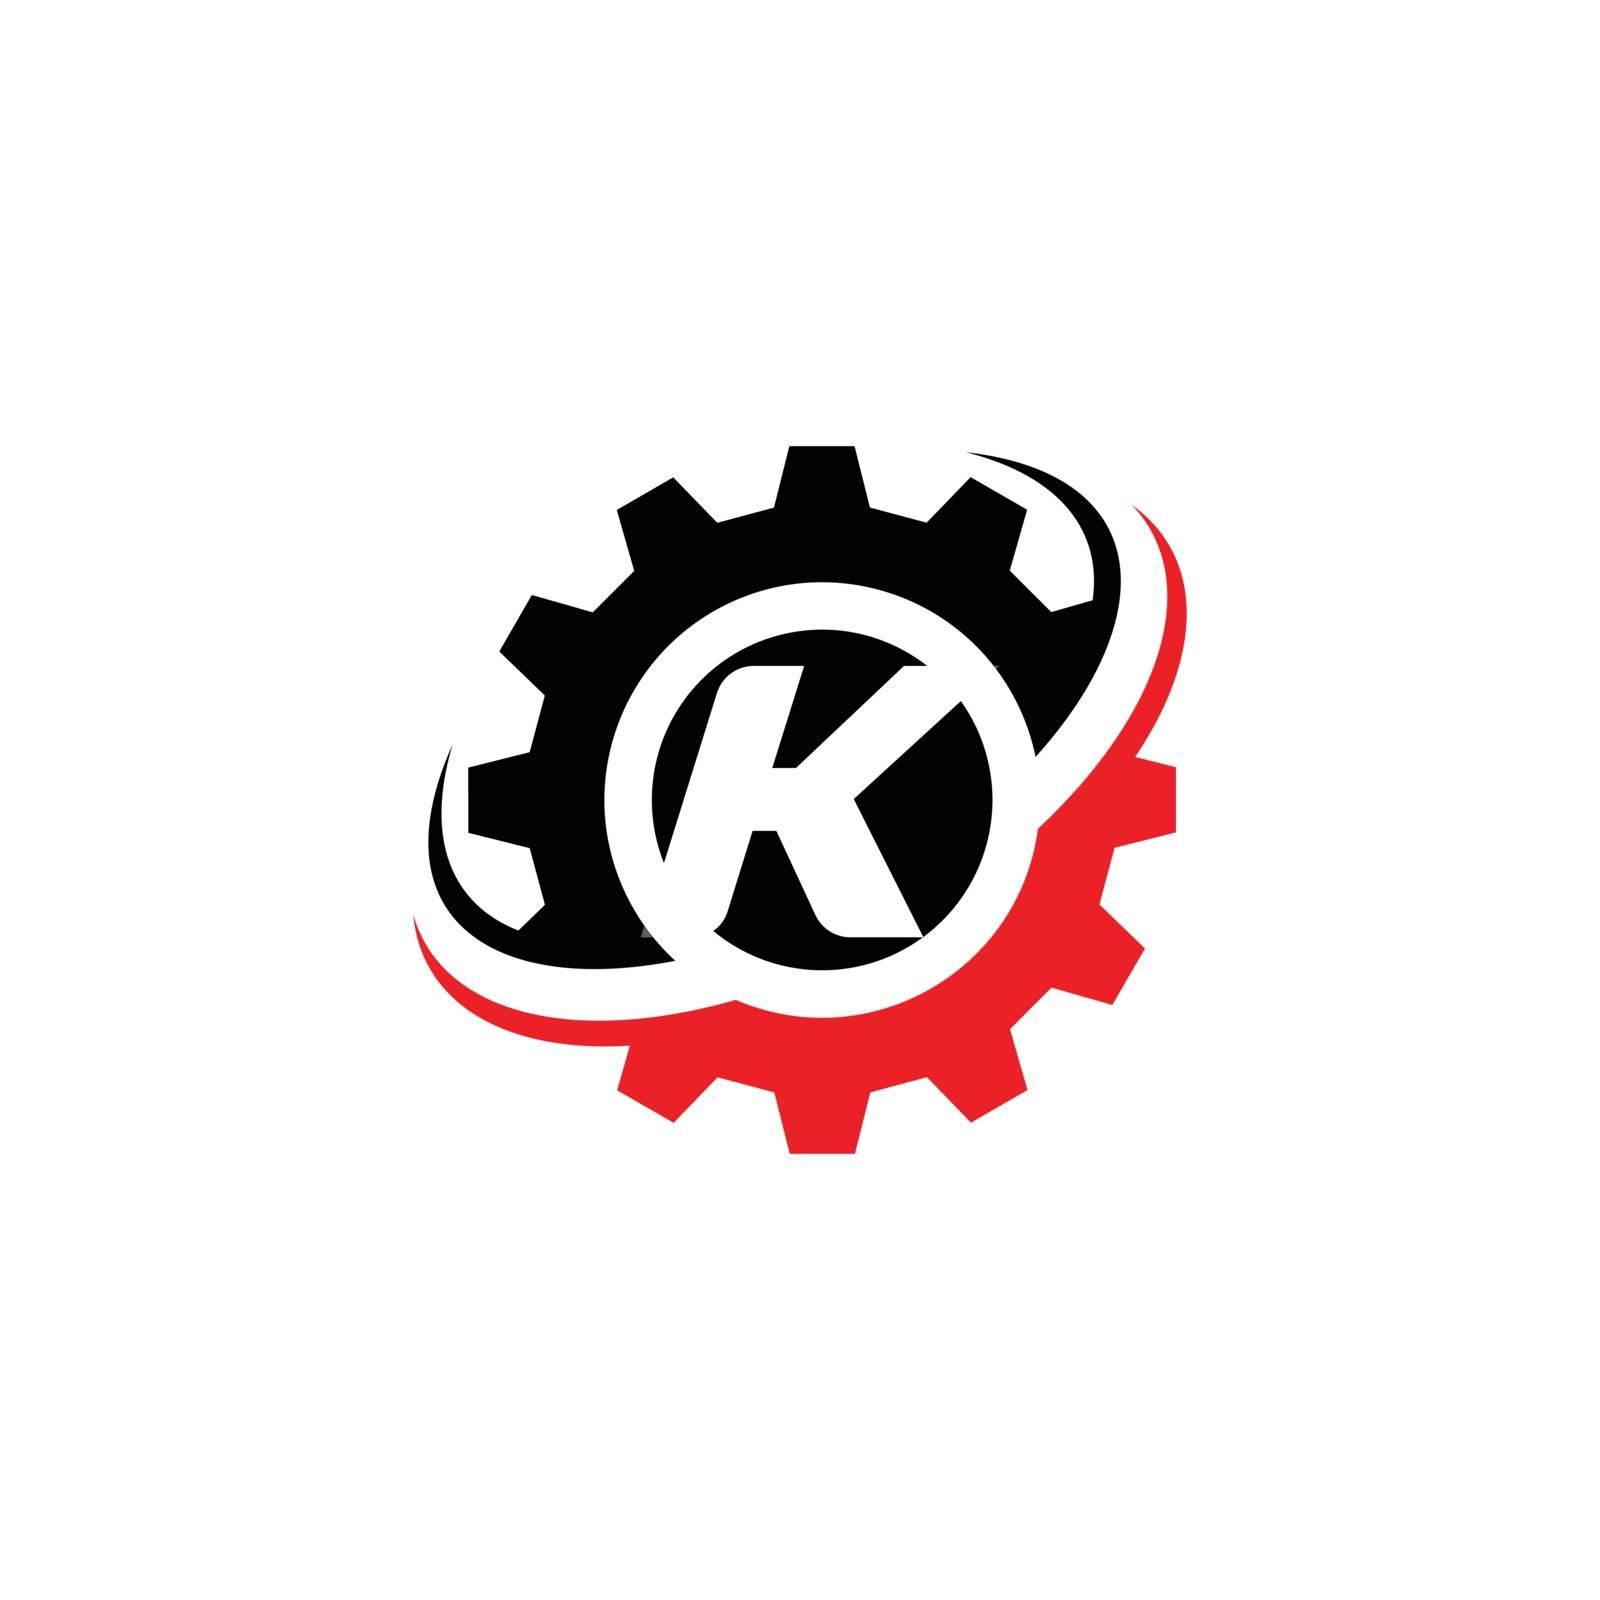 Letter K Gear Logo Design Template